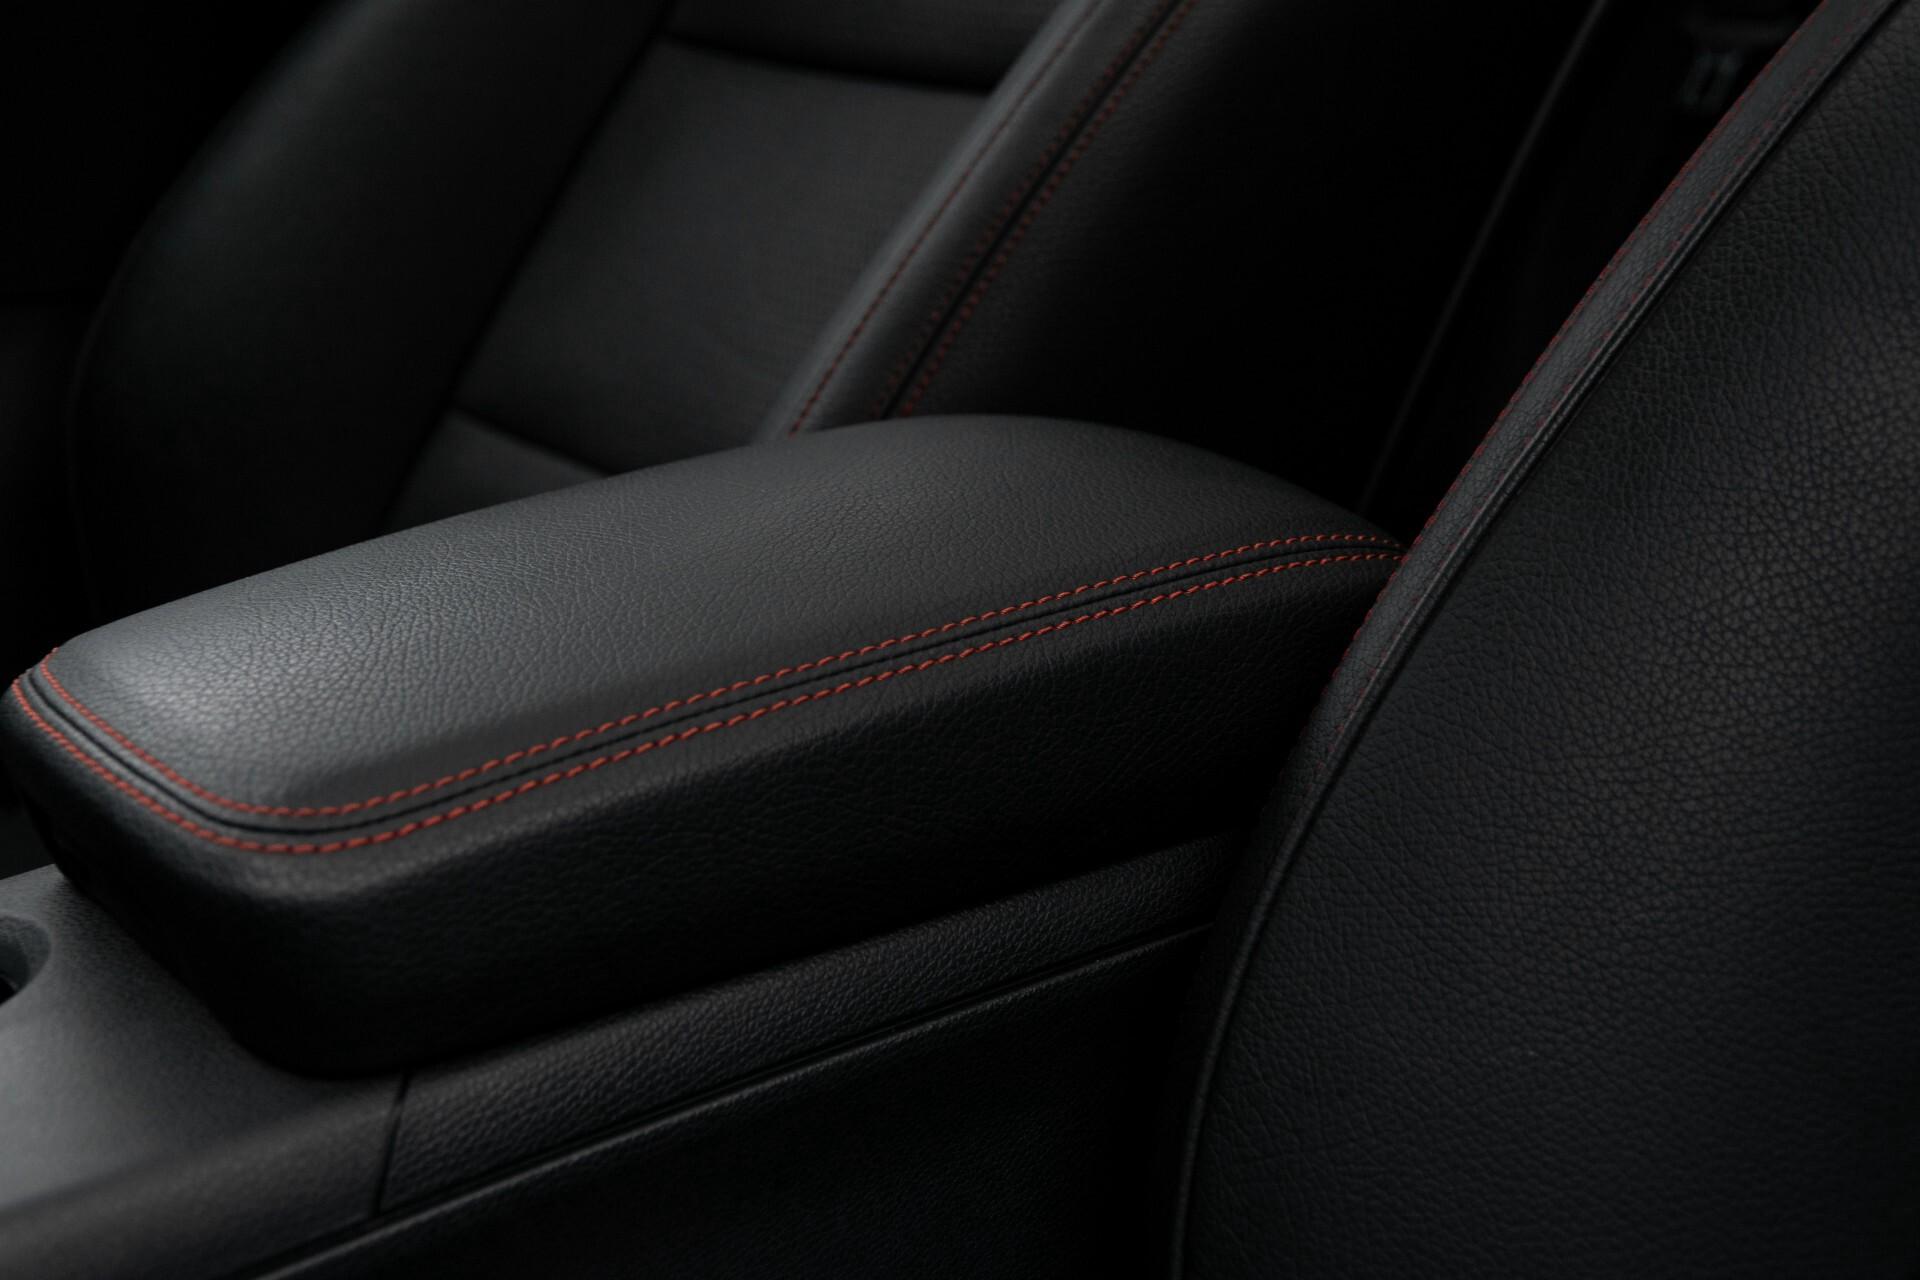 Mercedes-Benz A-Klasse 250 Sport AMG Panorama/Standkachel/Mem/Harman-Kardon/Distronic/Camera/Com Aut7 Foto 48